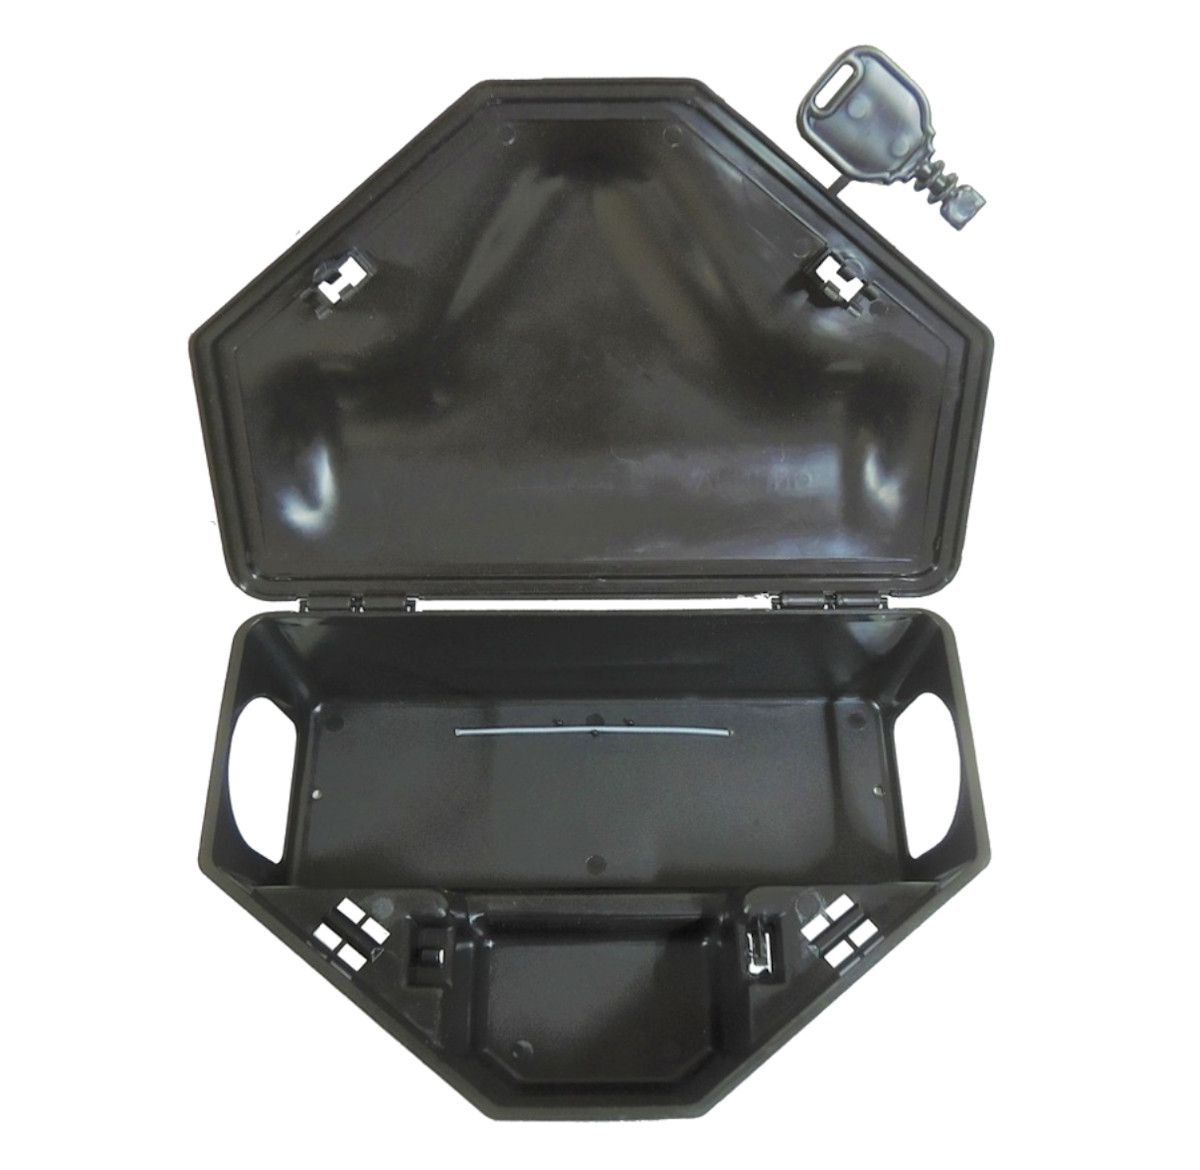 Kit 54 Porta Isca Com 2 Chaves - Duplo Travamento